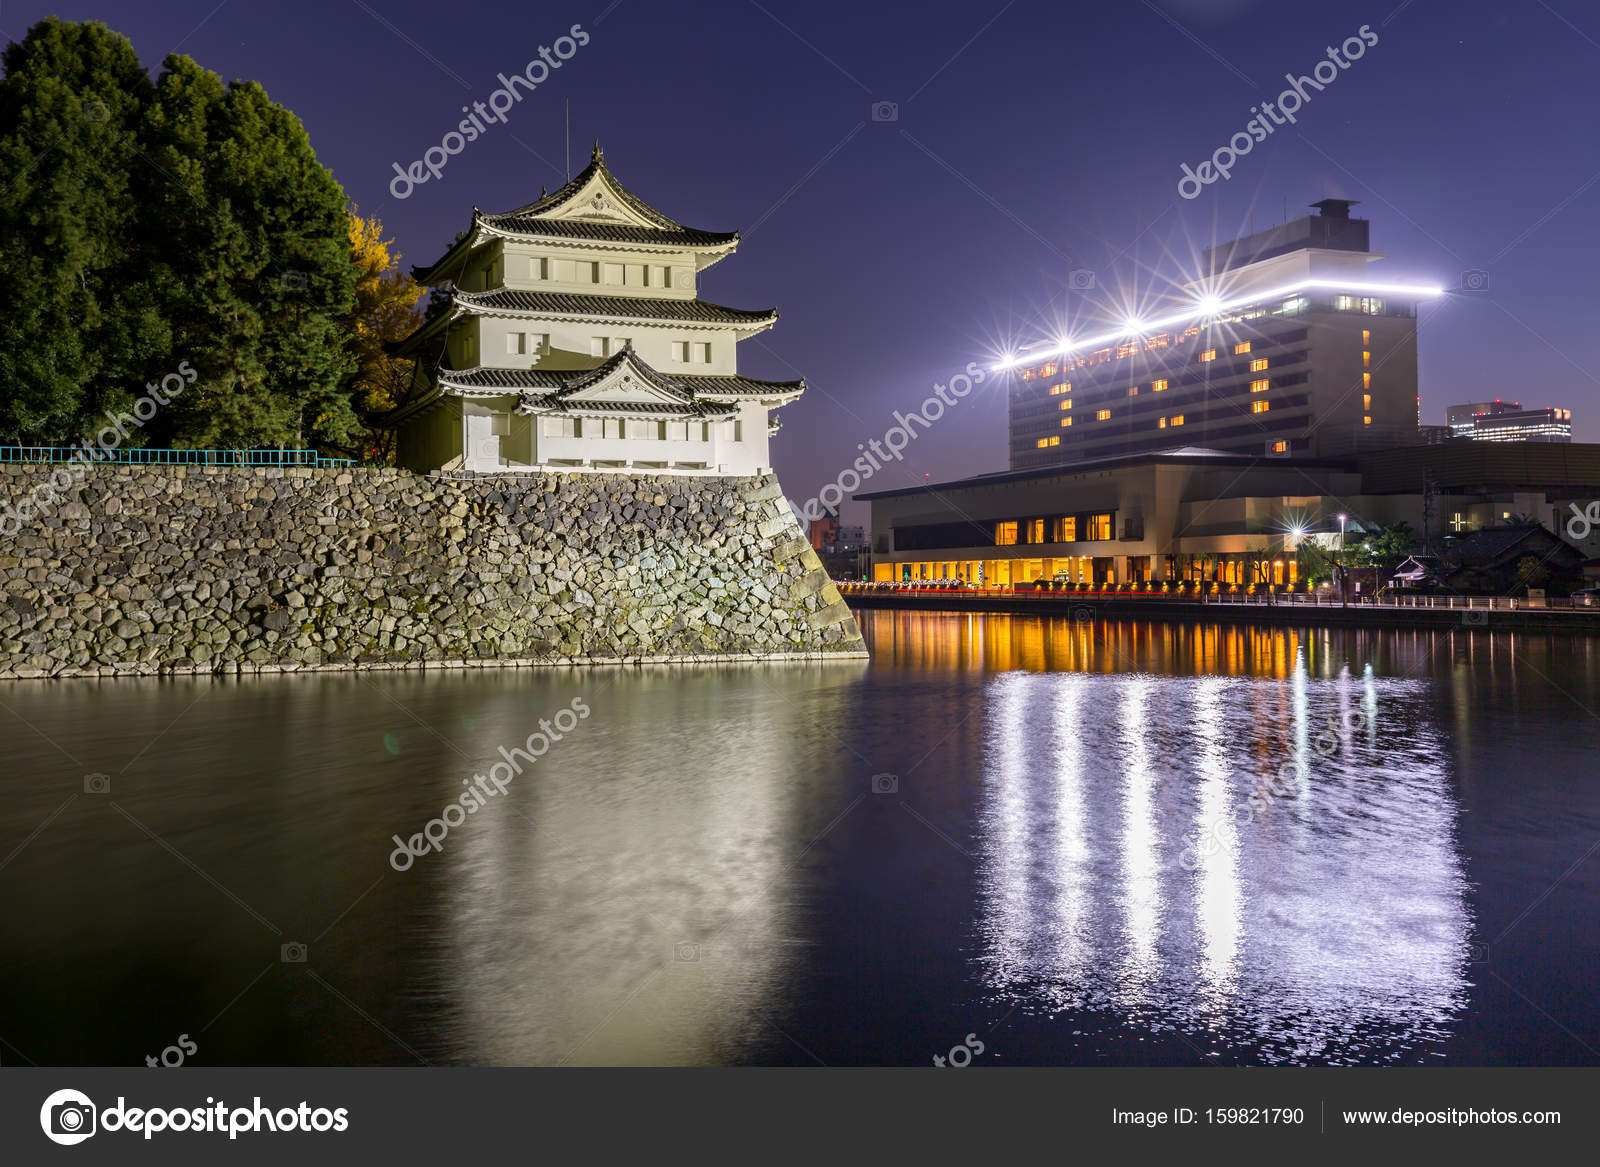 Nagoya Castle At Night Stock Editorial Photo C Vichie81 159821790